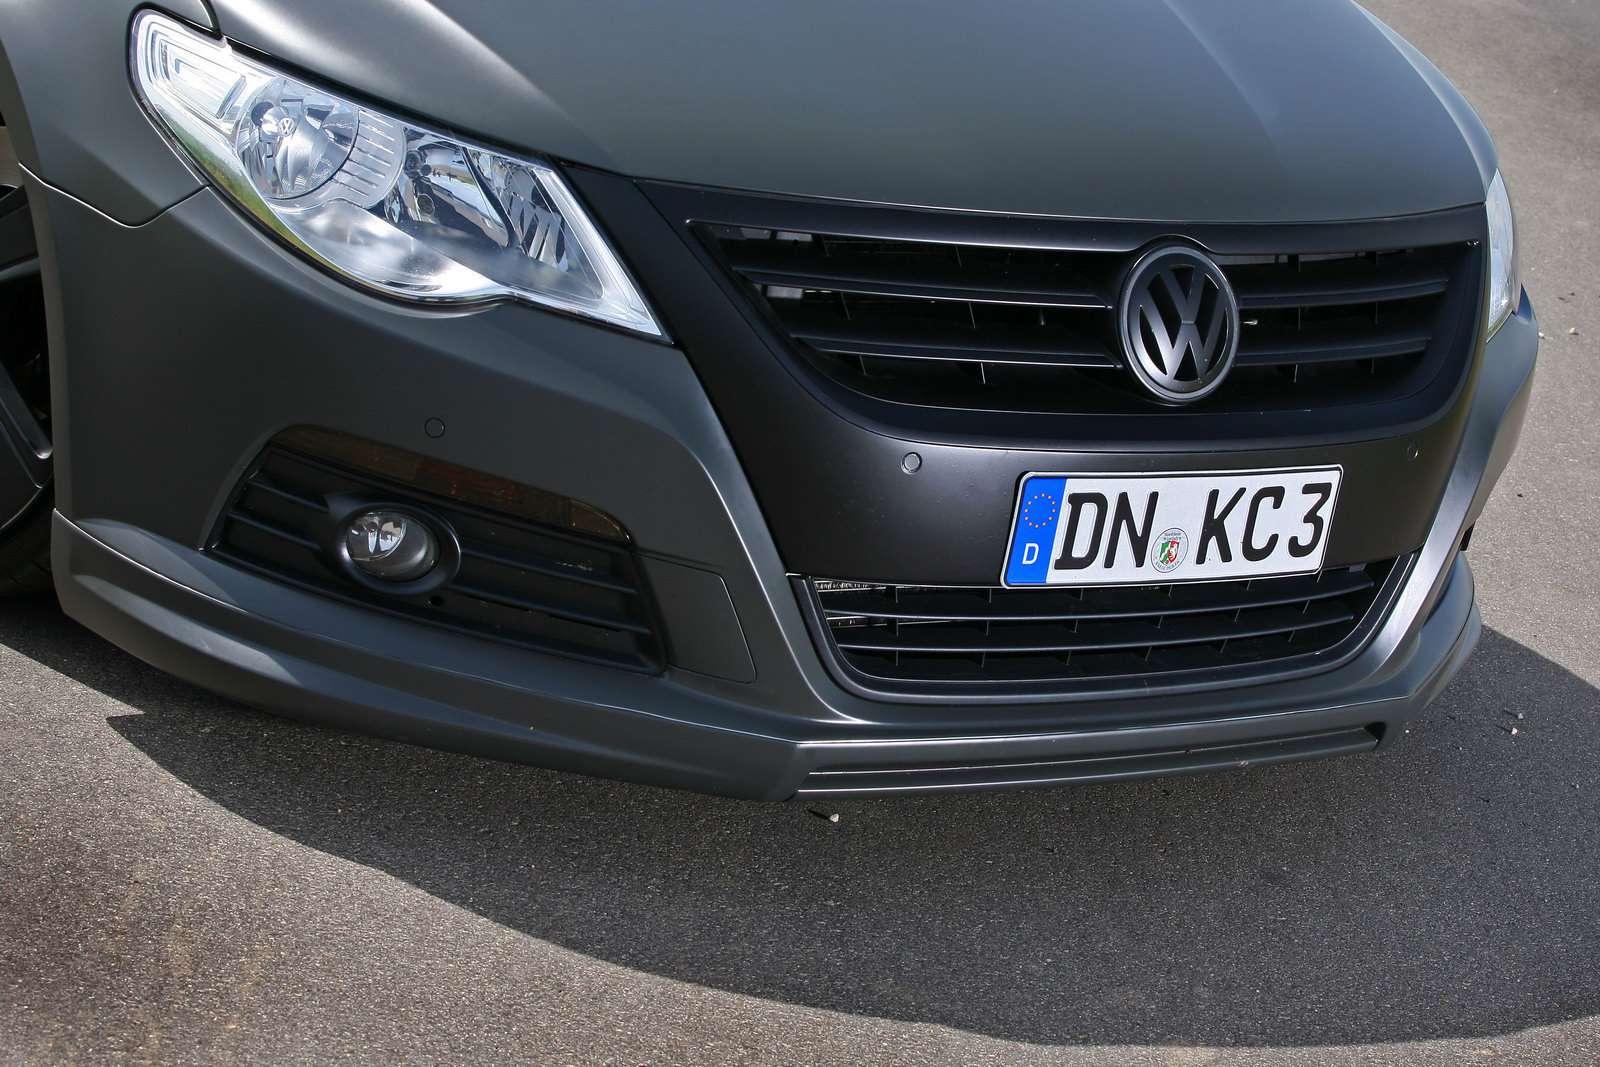 Volkswagen Passat CC od KBR Motorsport maj 2011